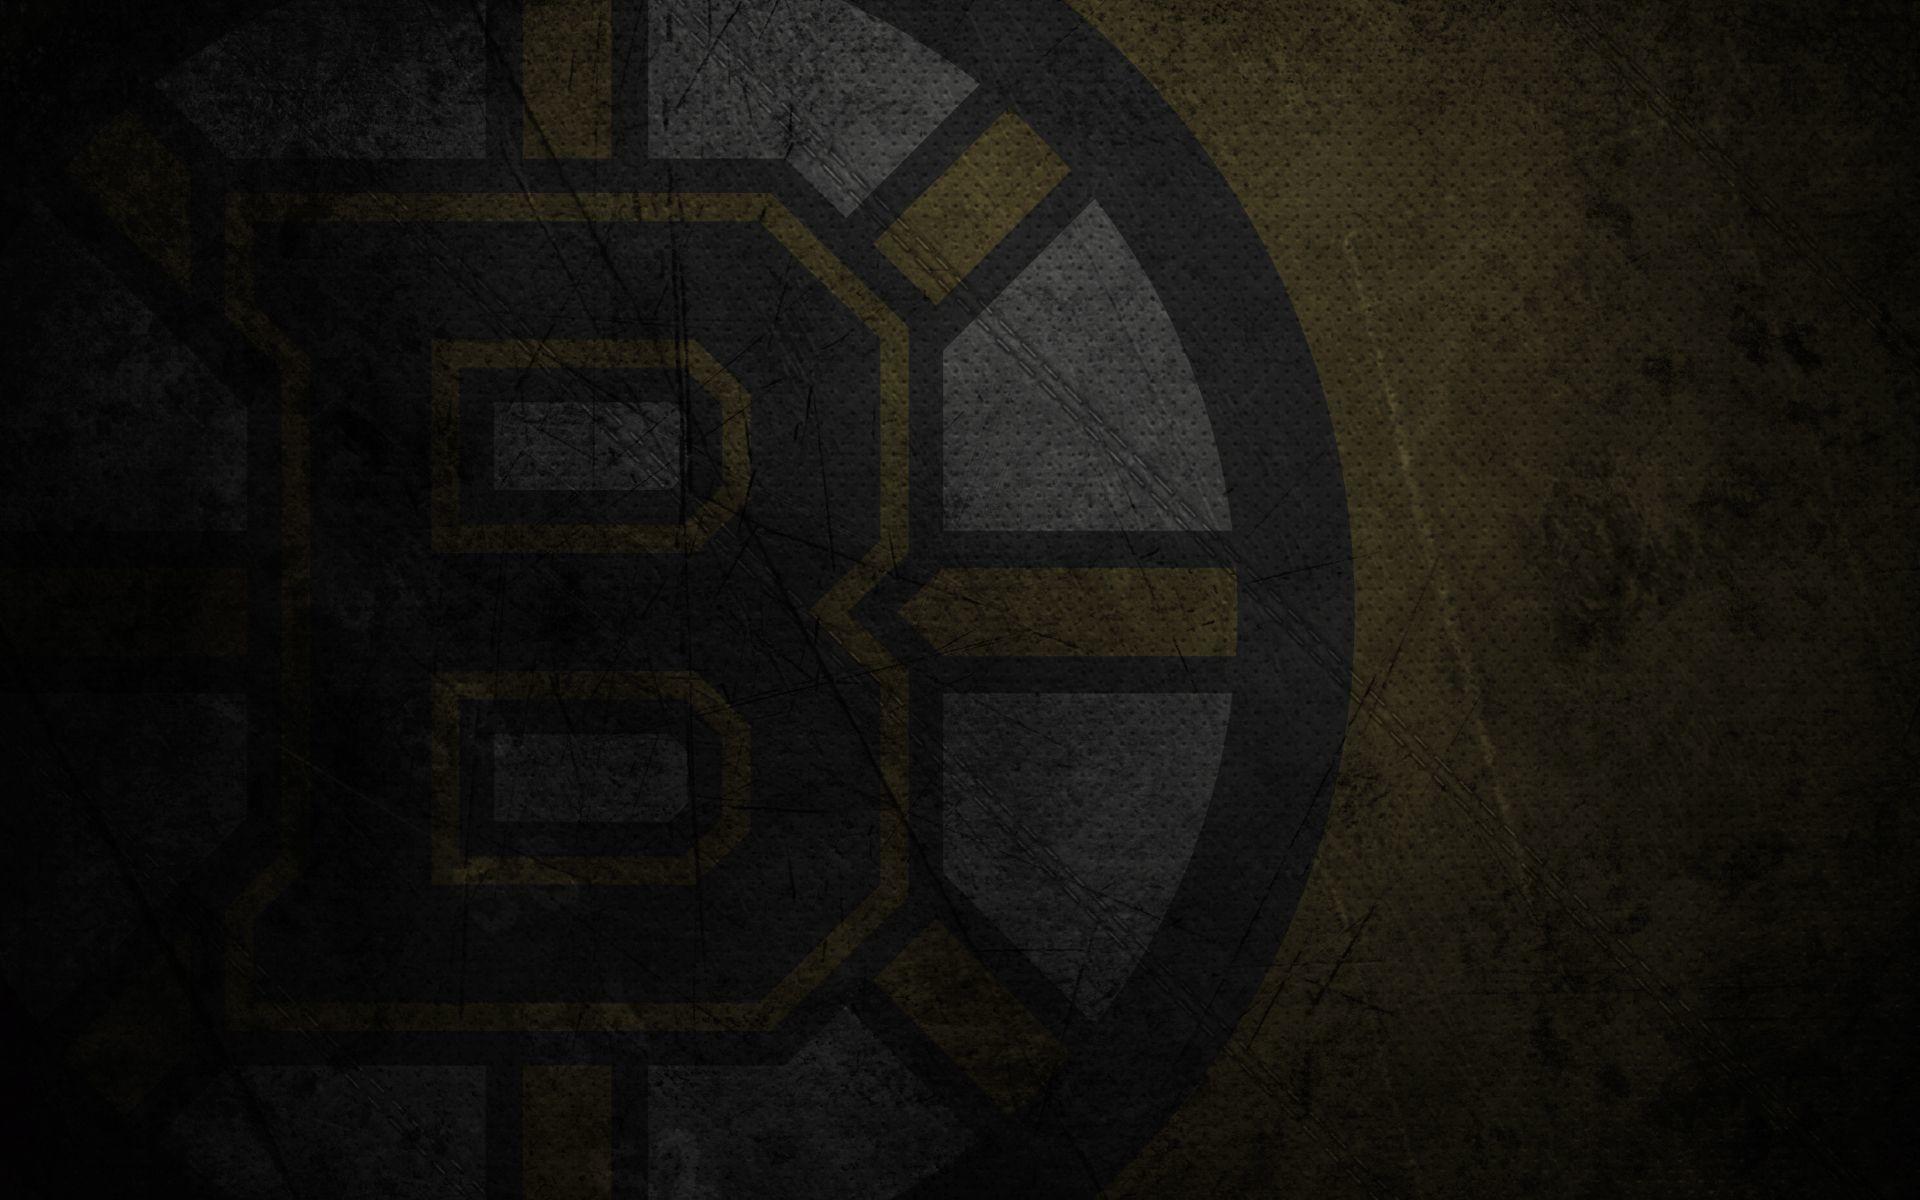 Wallpapers For Boston Bruins Wallpaper wwwshowallpaperscom